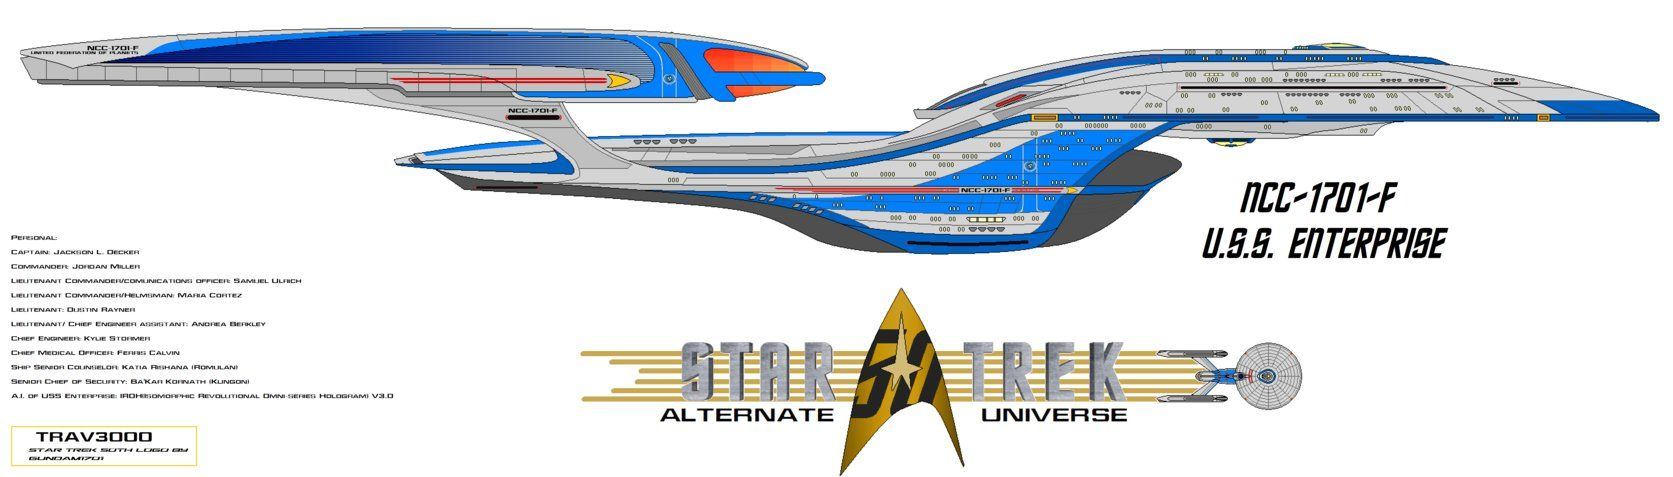 USS Enterprise NCC 1701 F   Star trek crew, Star trek quotes